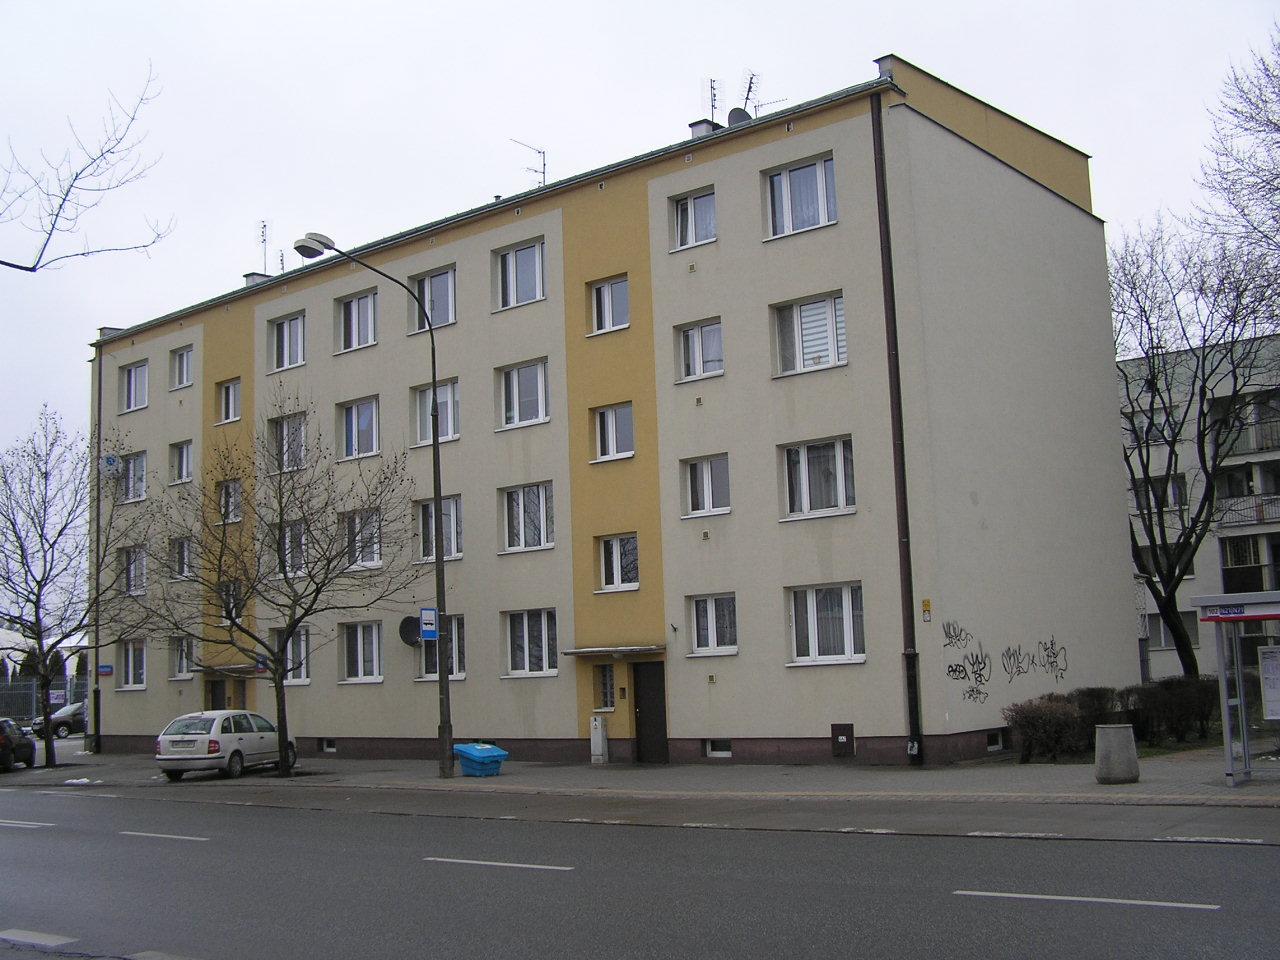 Podskarbińska 12